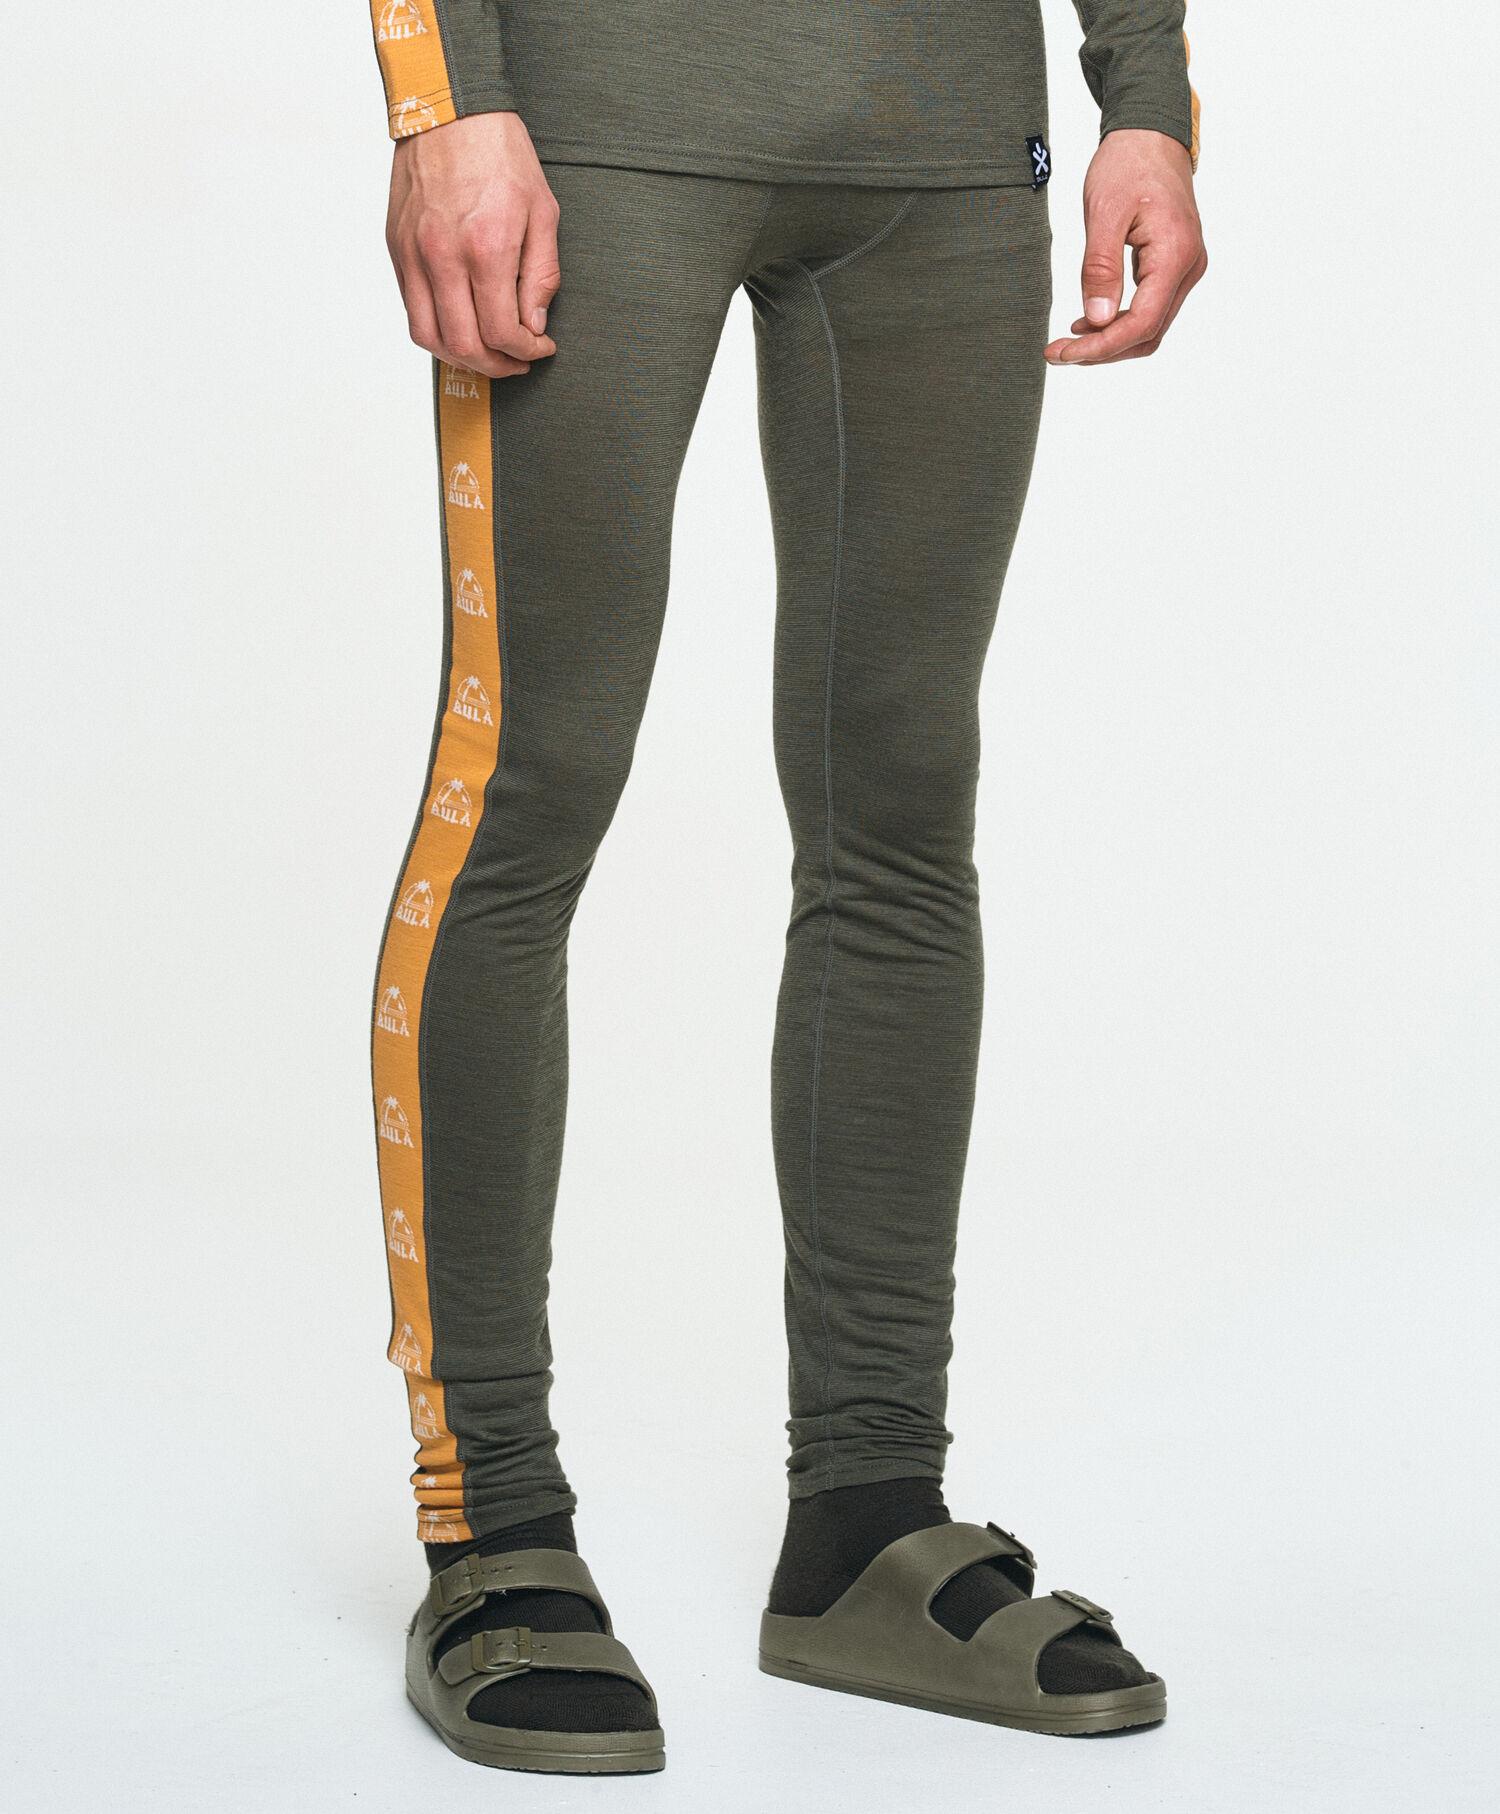 Bula Tape Merino Wool pants